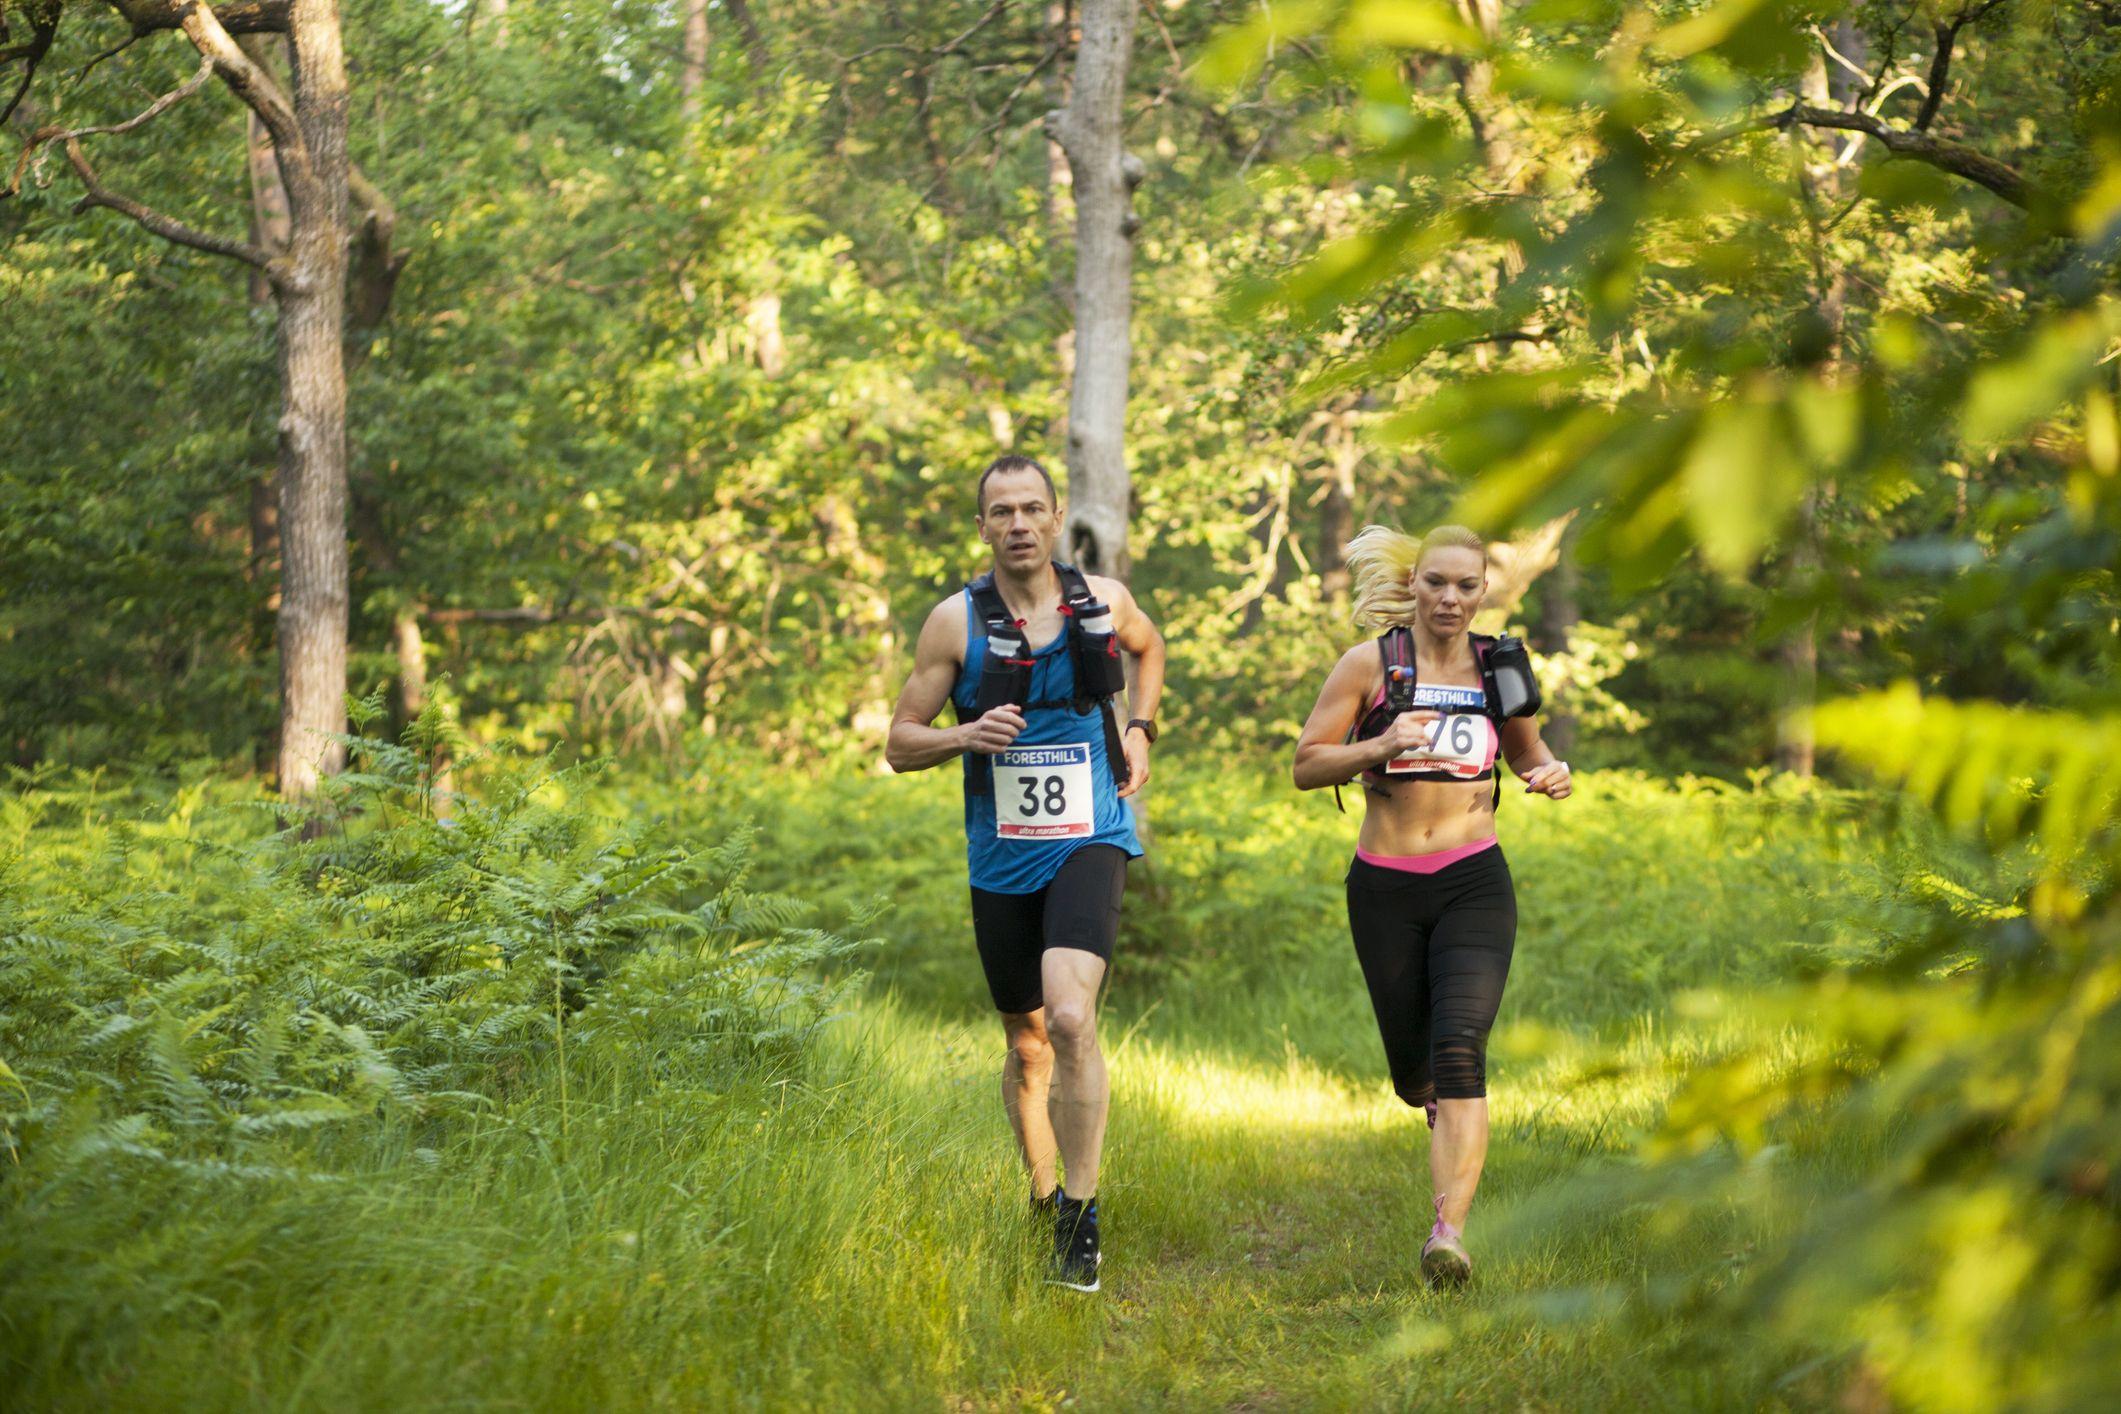 Trail Race Calendar 2022.2021 Trail Race Calendar Trails Races Near Me